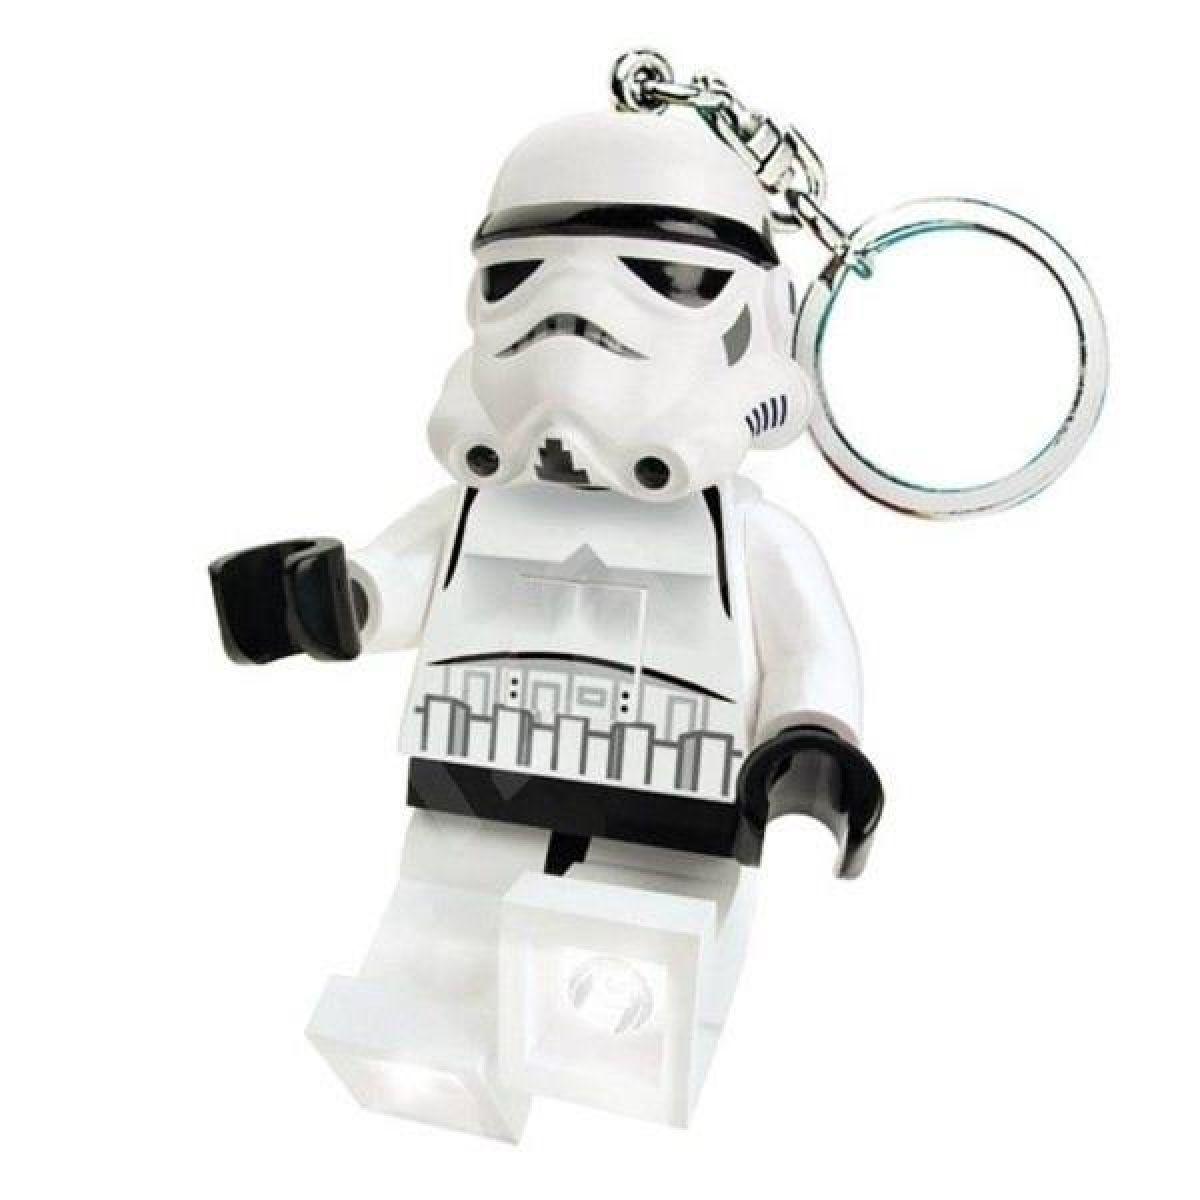 Lego Star Wars First Order Stormtrooper svietiaca figúrka